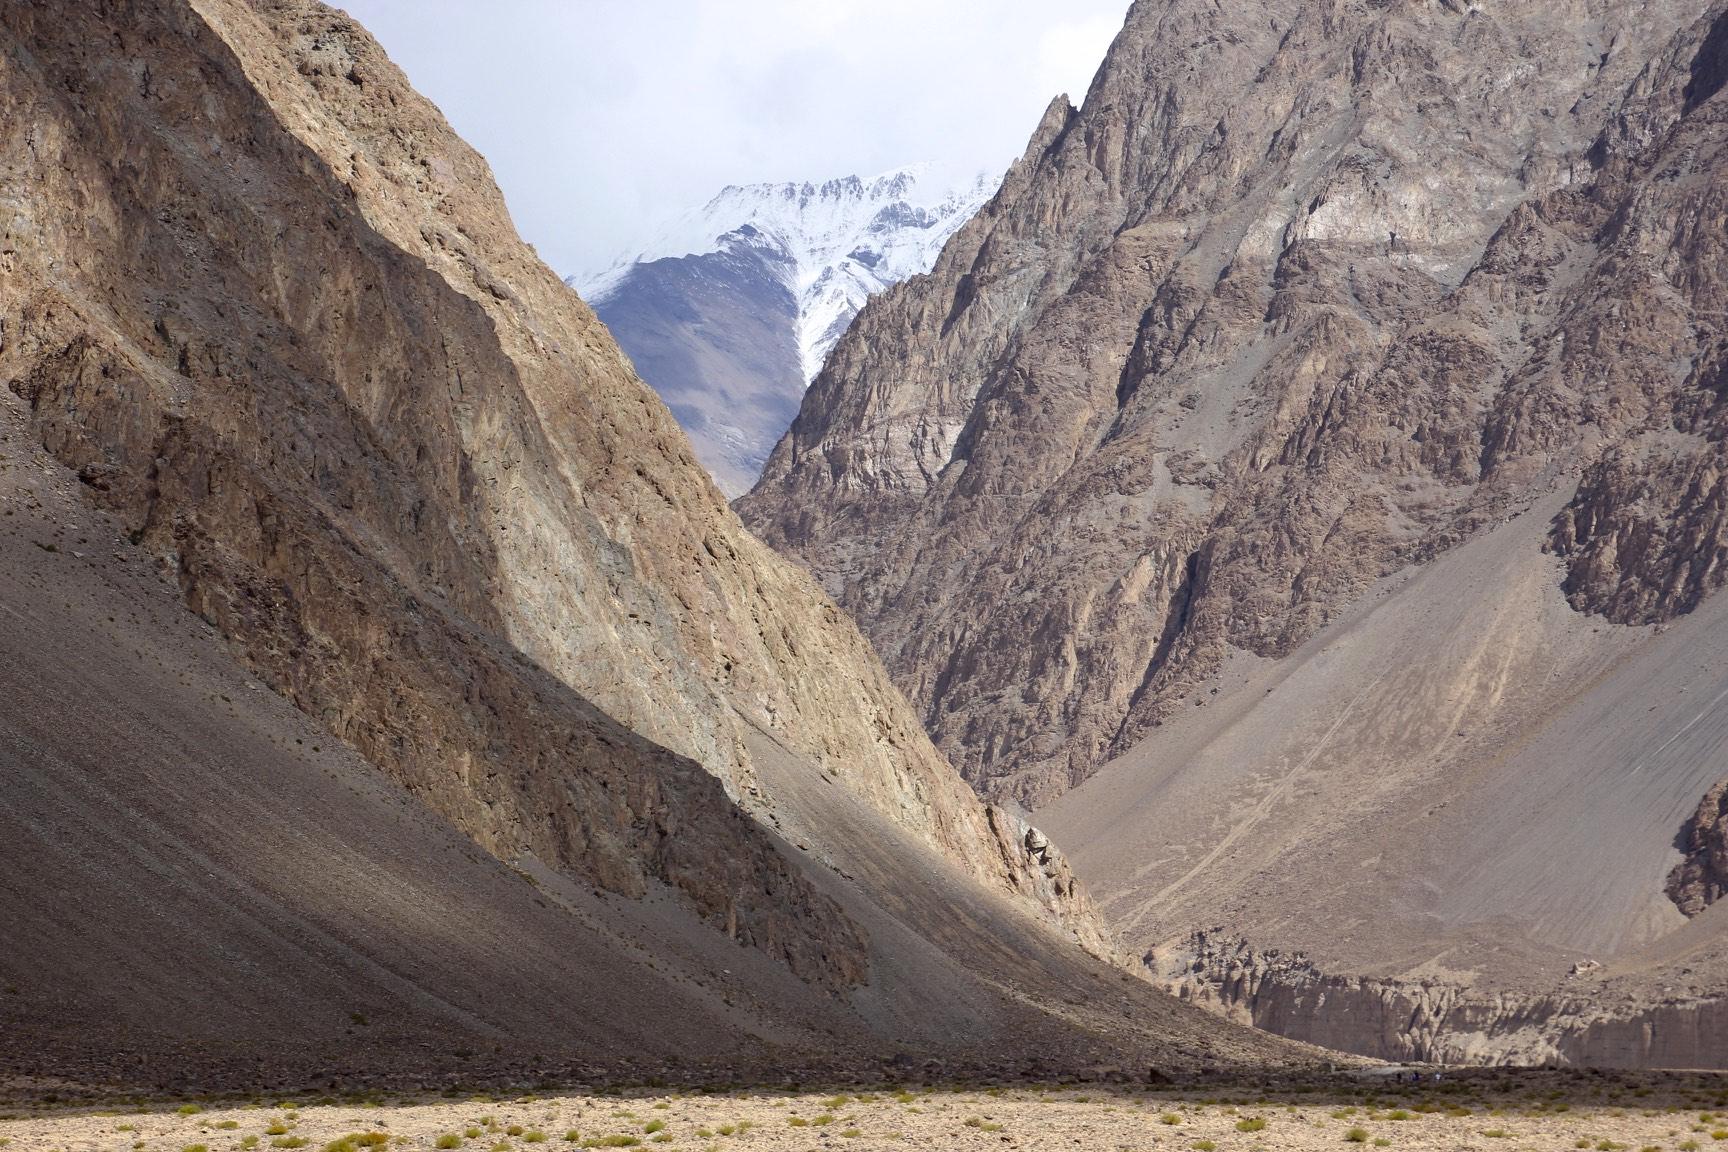 Start of our trek - the north Karakoram mountains